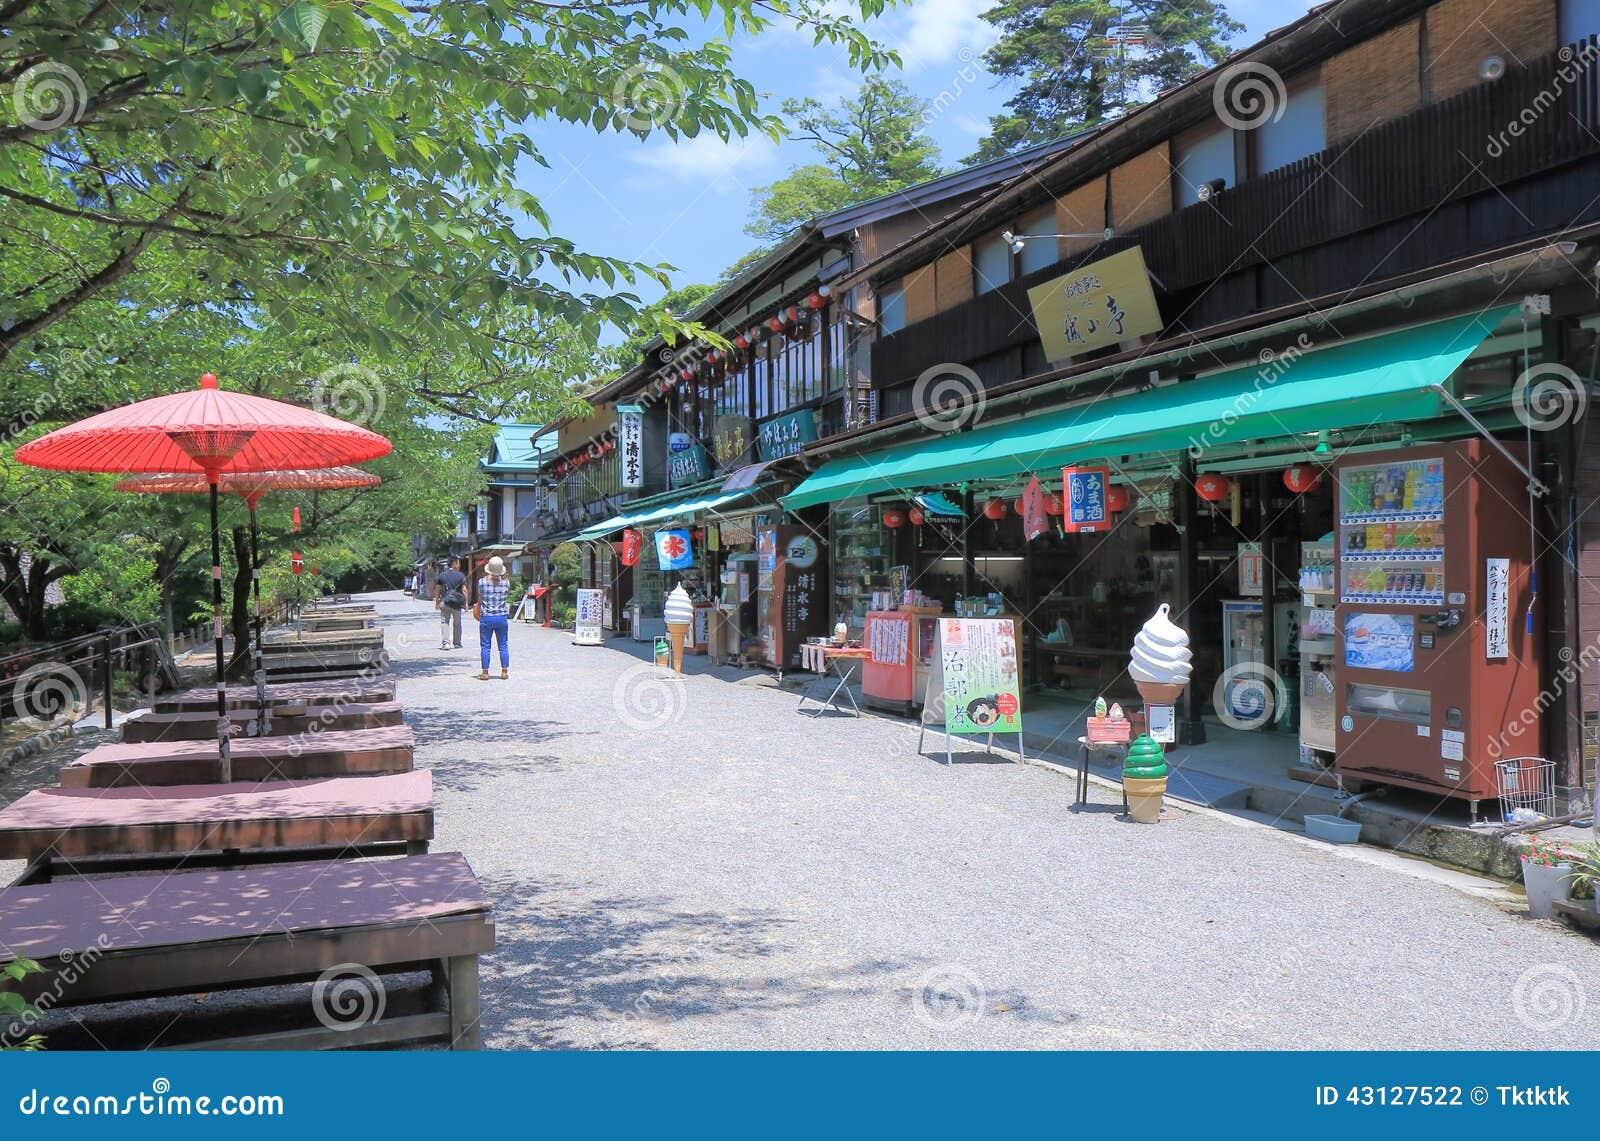 image Hentai japanese traditional restaurant hikaru kirishima